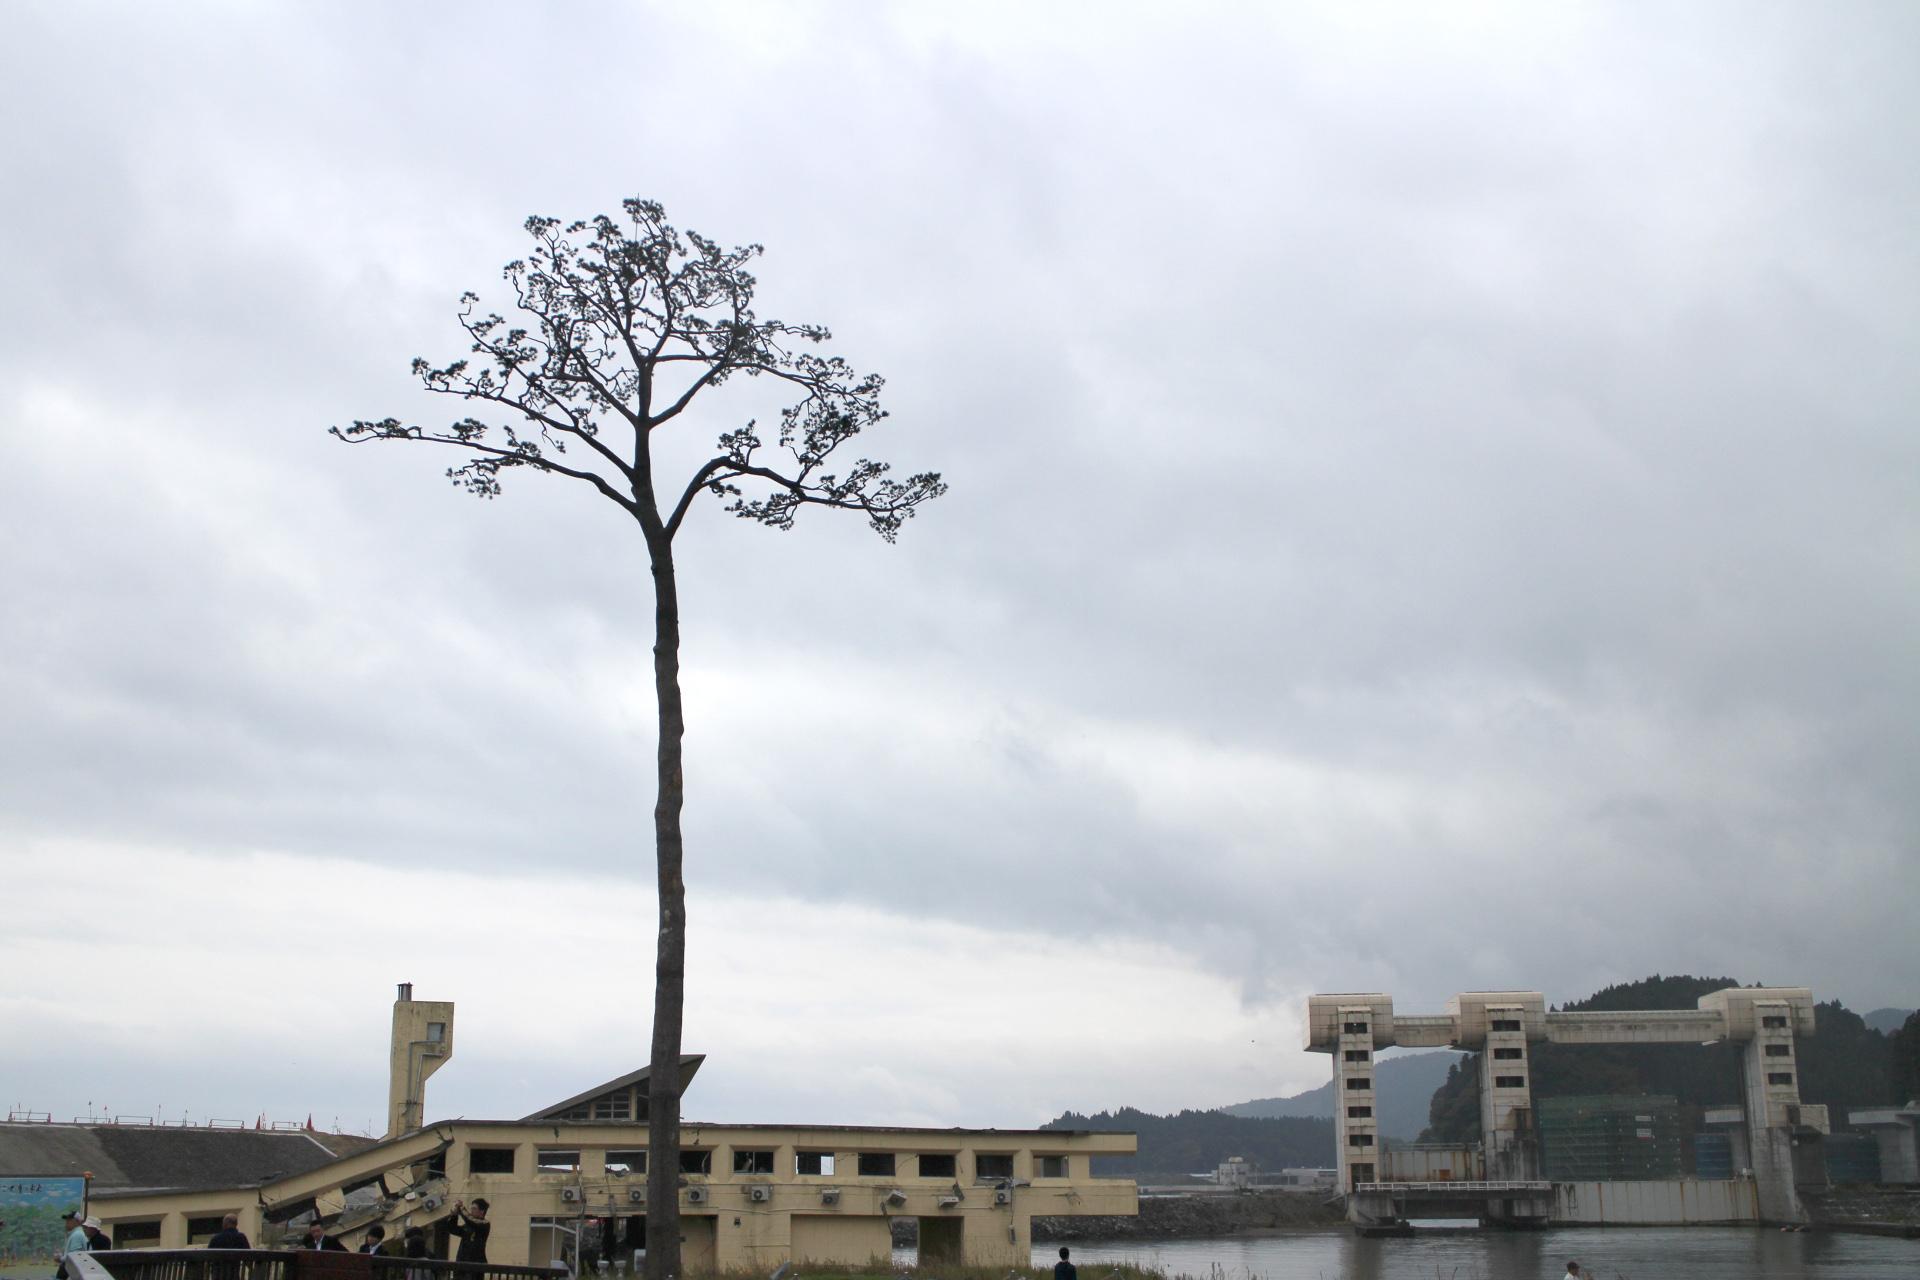 shinsaijpg (1)